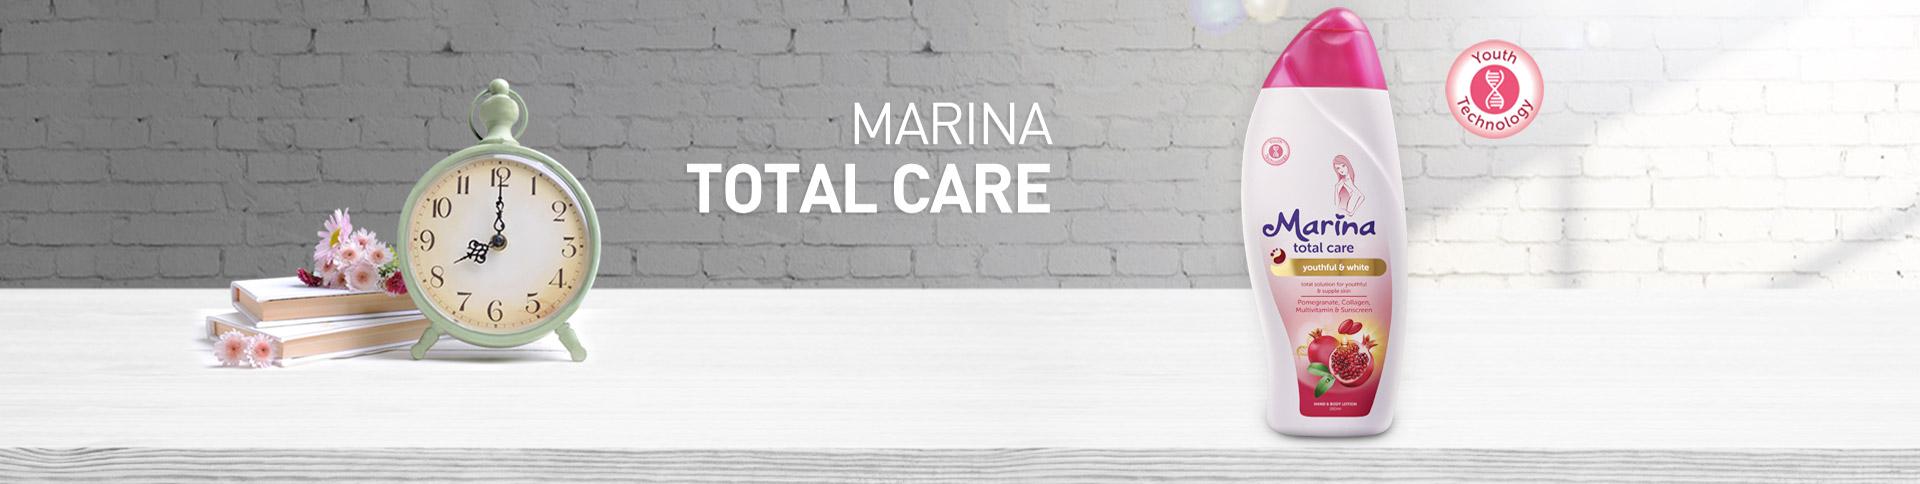 MARINA TOTAL CARE